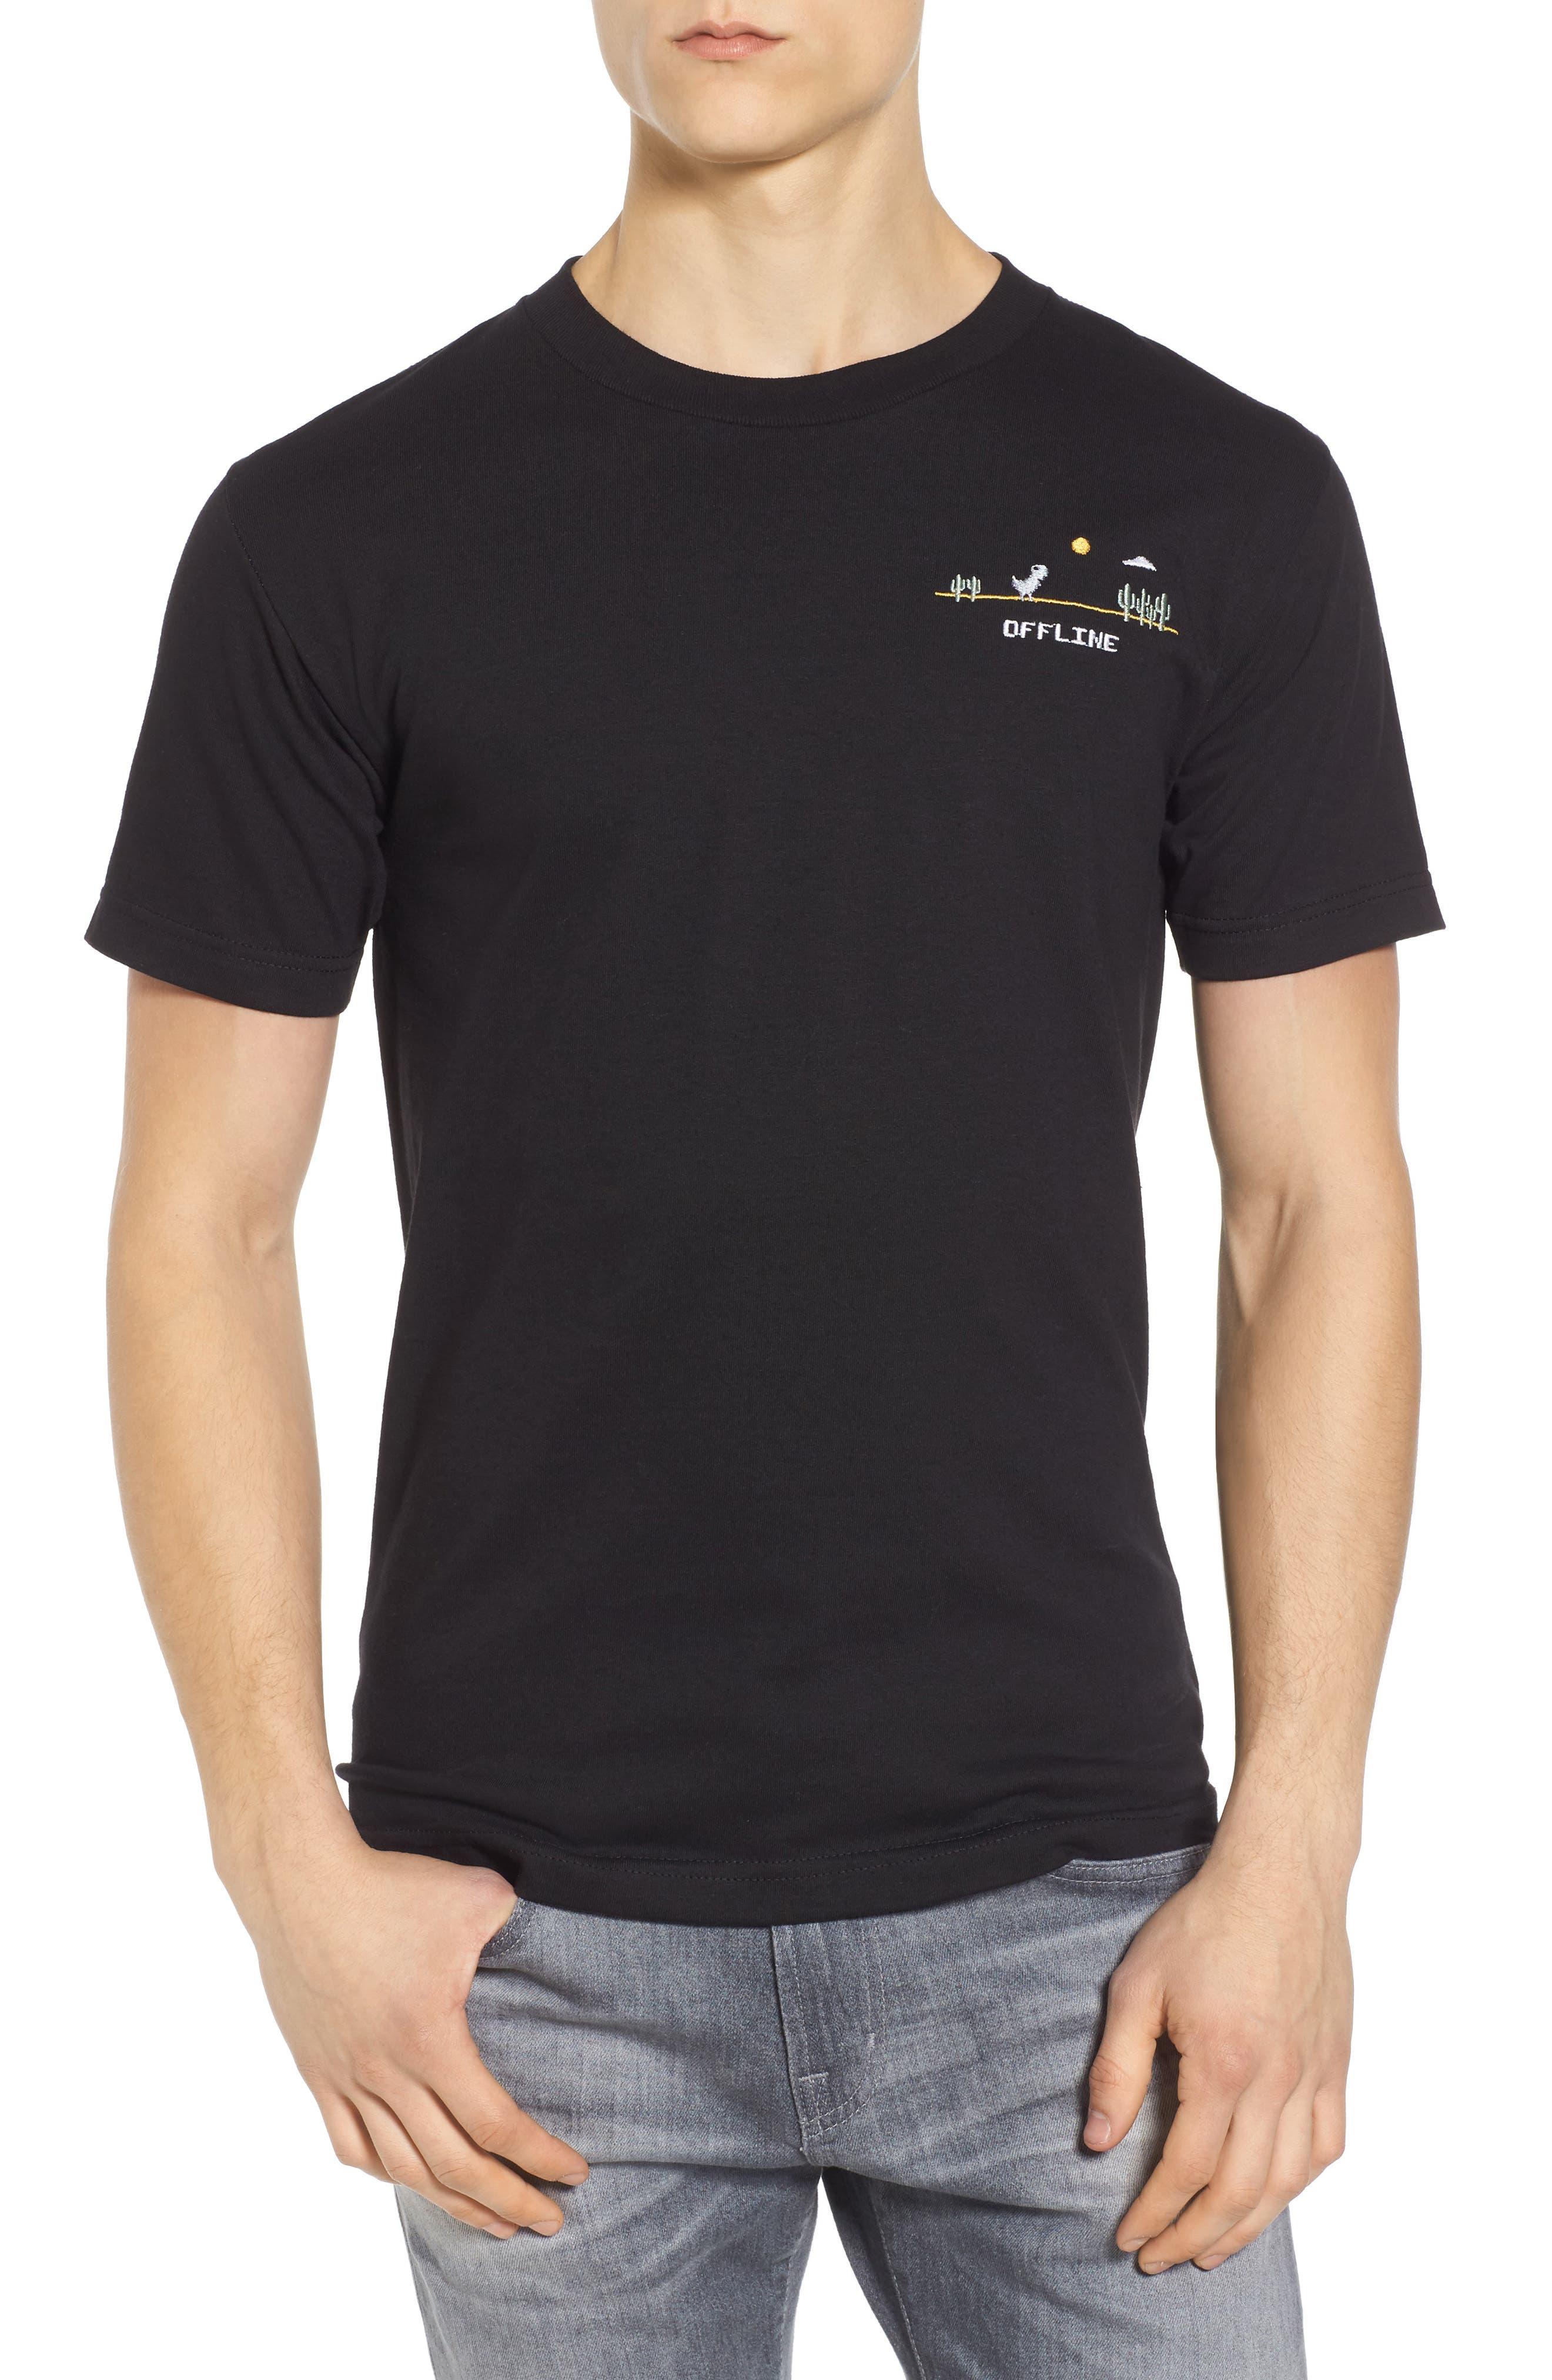 Alternate Image 1 Selected - Altru Dino Offline T-Shirt